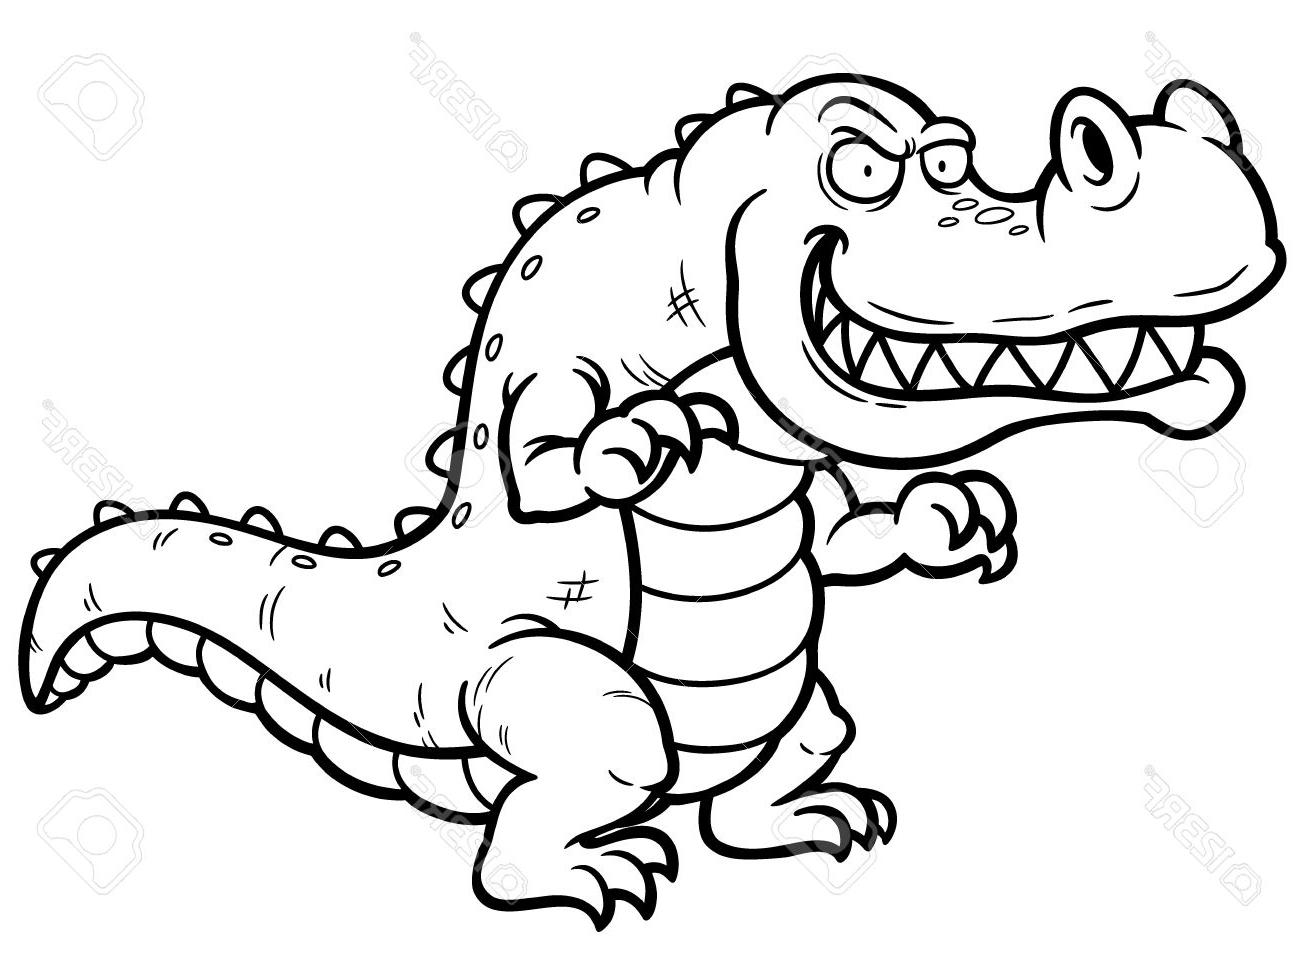 1300x975 Crocodile Cartoon Drawing Crocodile How To Draw A Crocodile